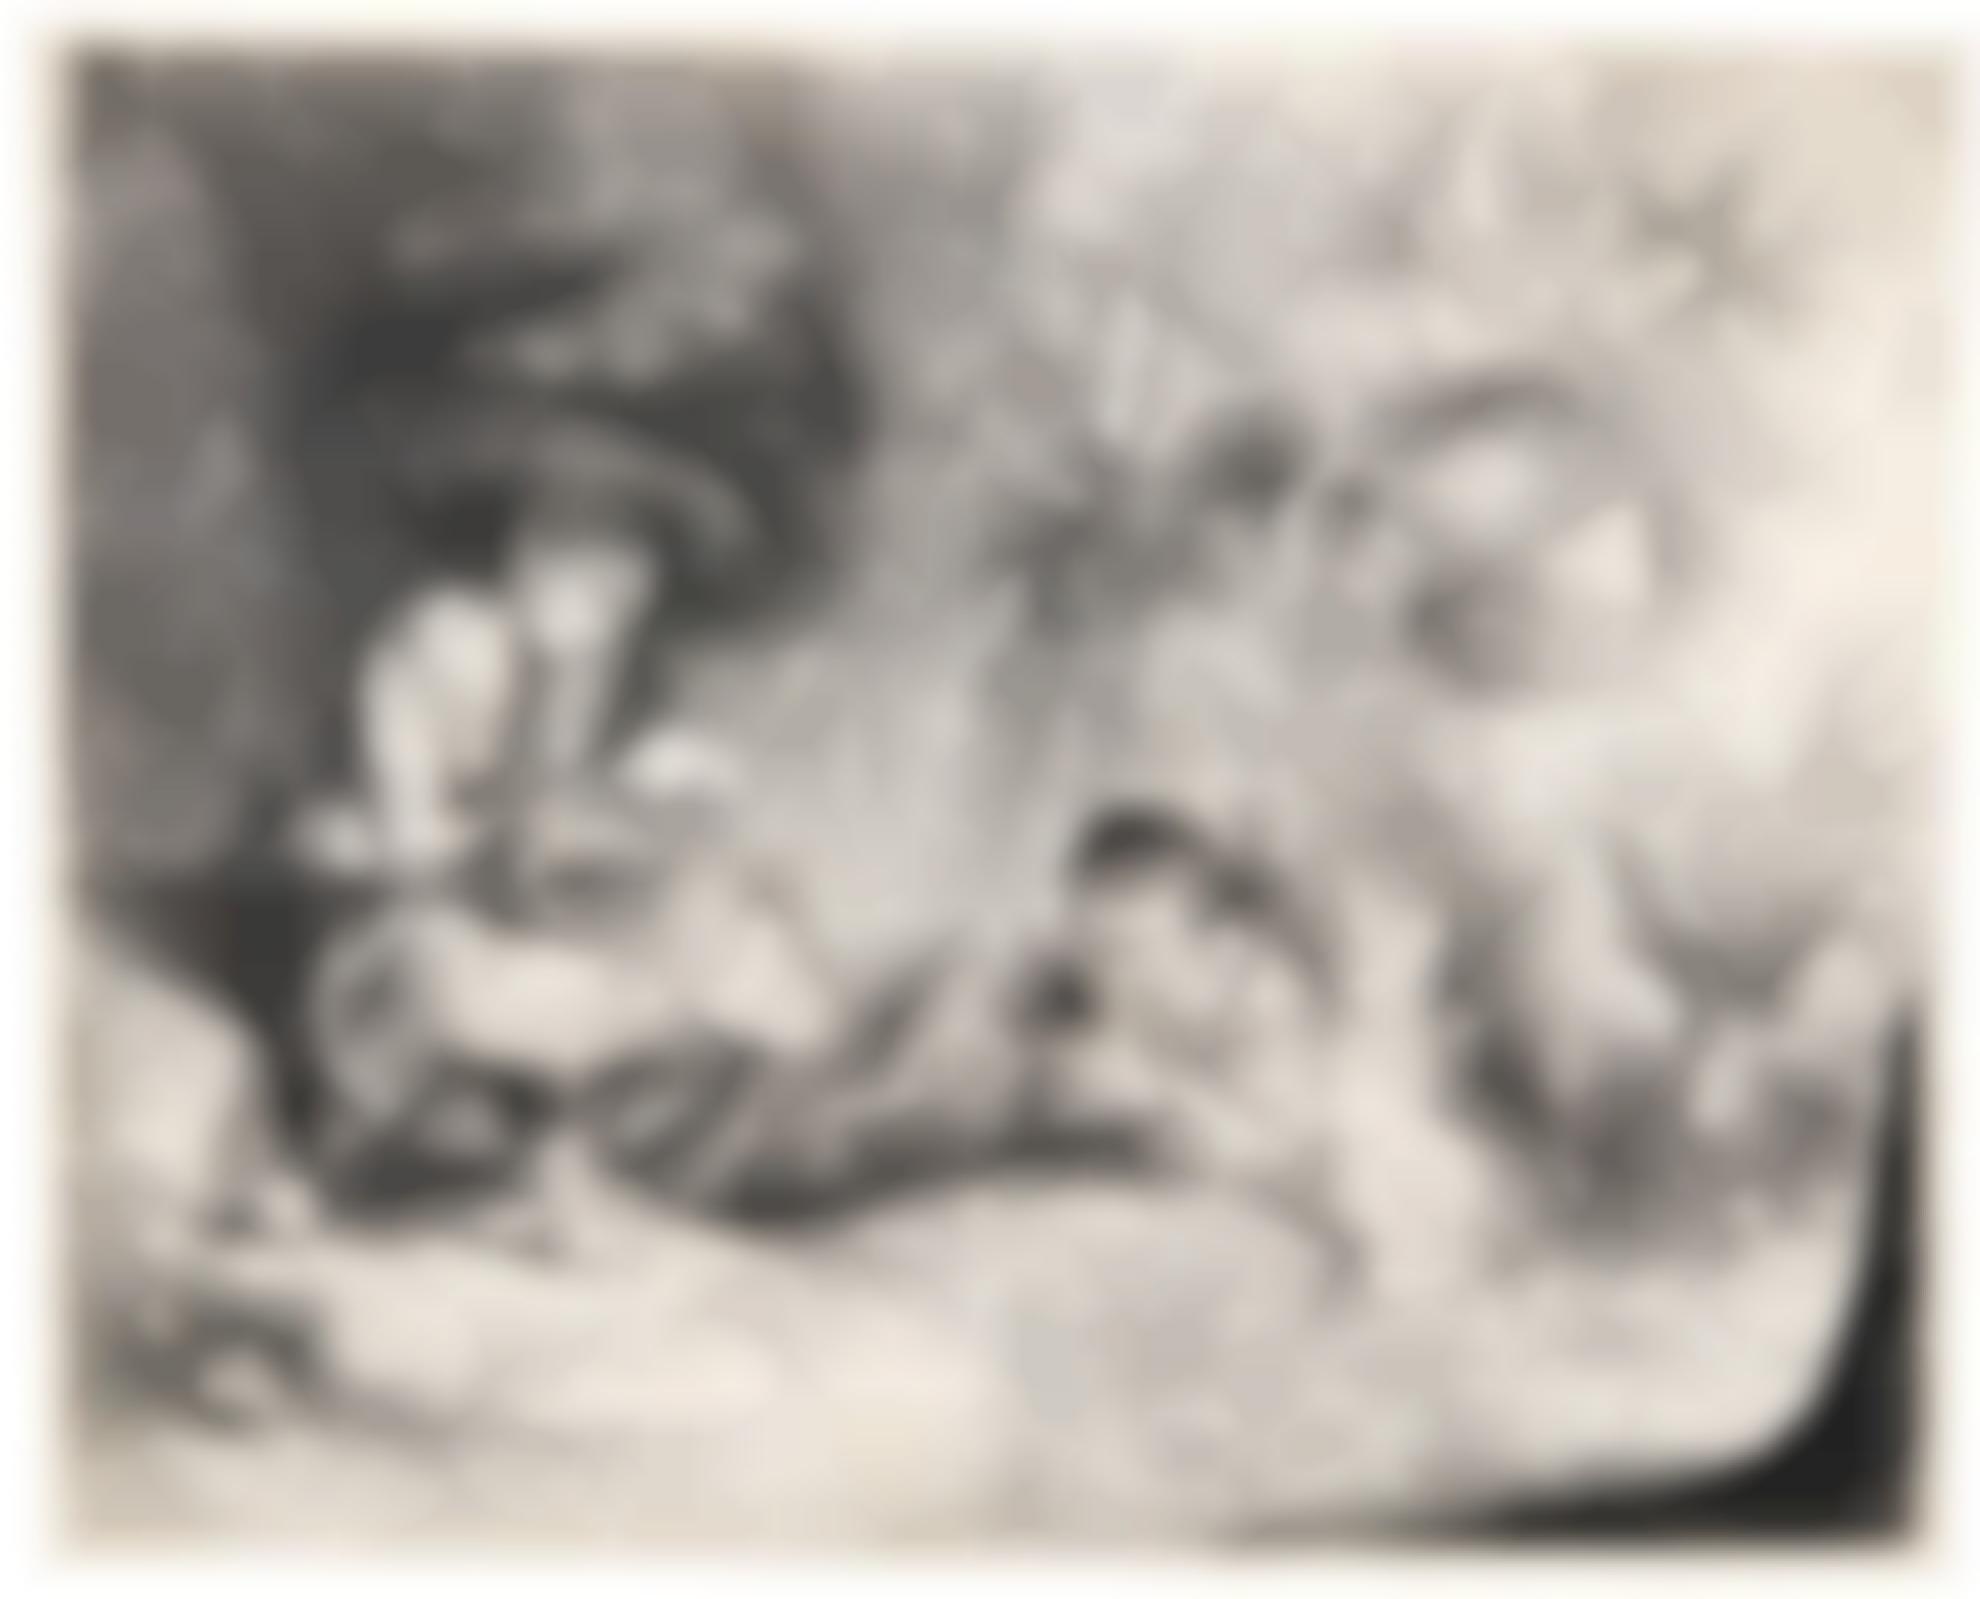 Rembrandt van Rijn-The Flute Player (Het Uilespiegeltje) (B., Holl. 188; New Holl. 211; H. 200)-1642